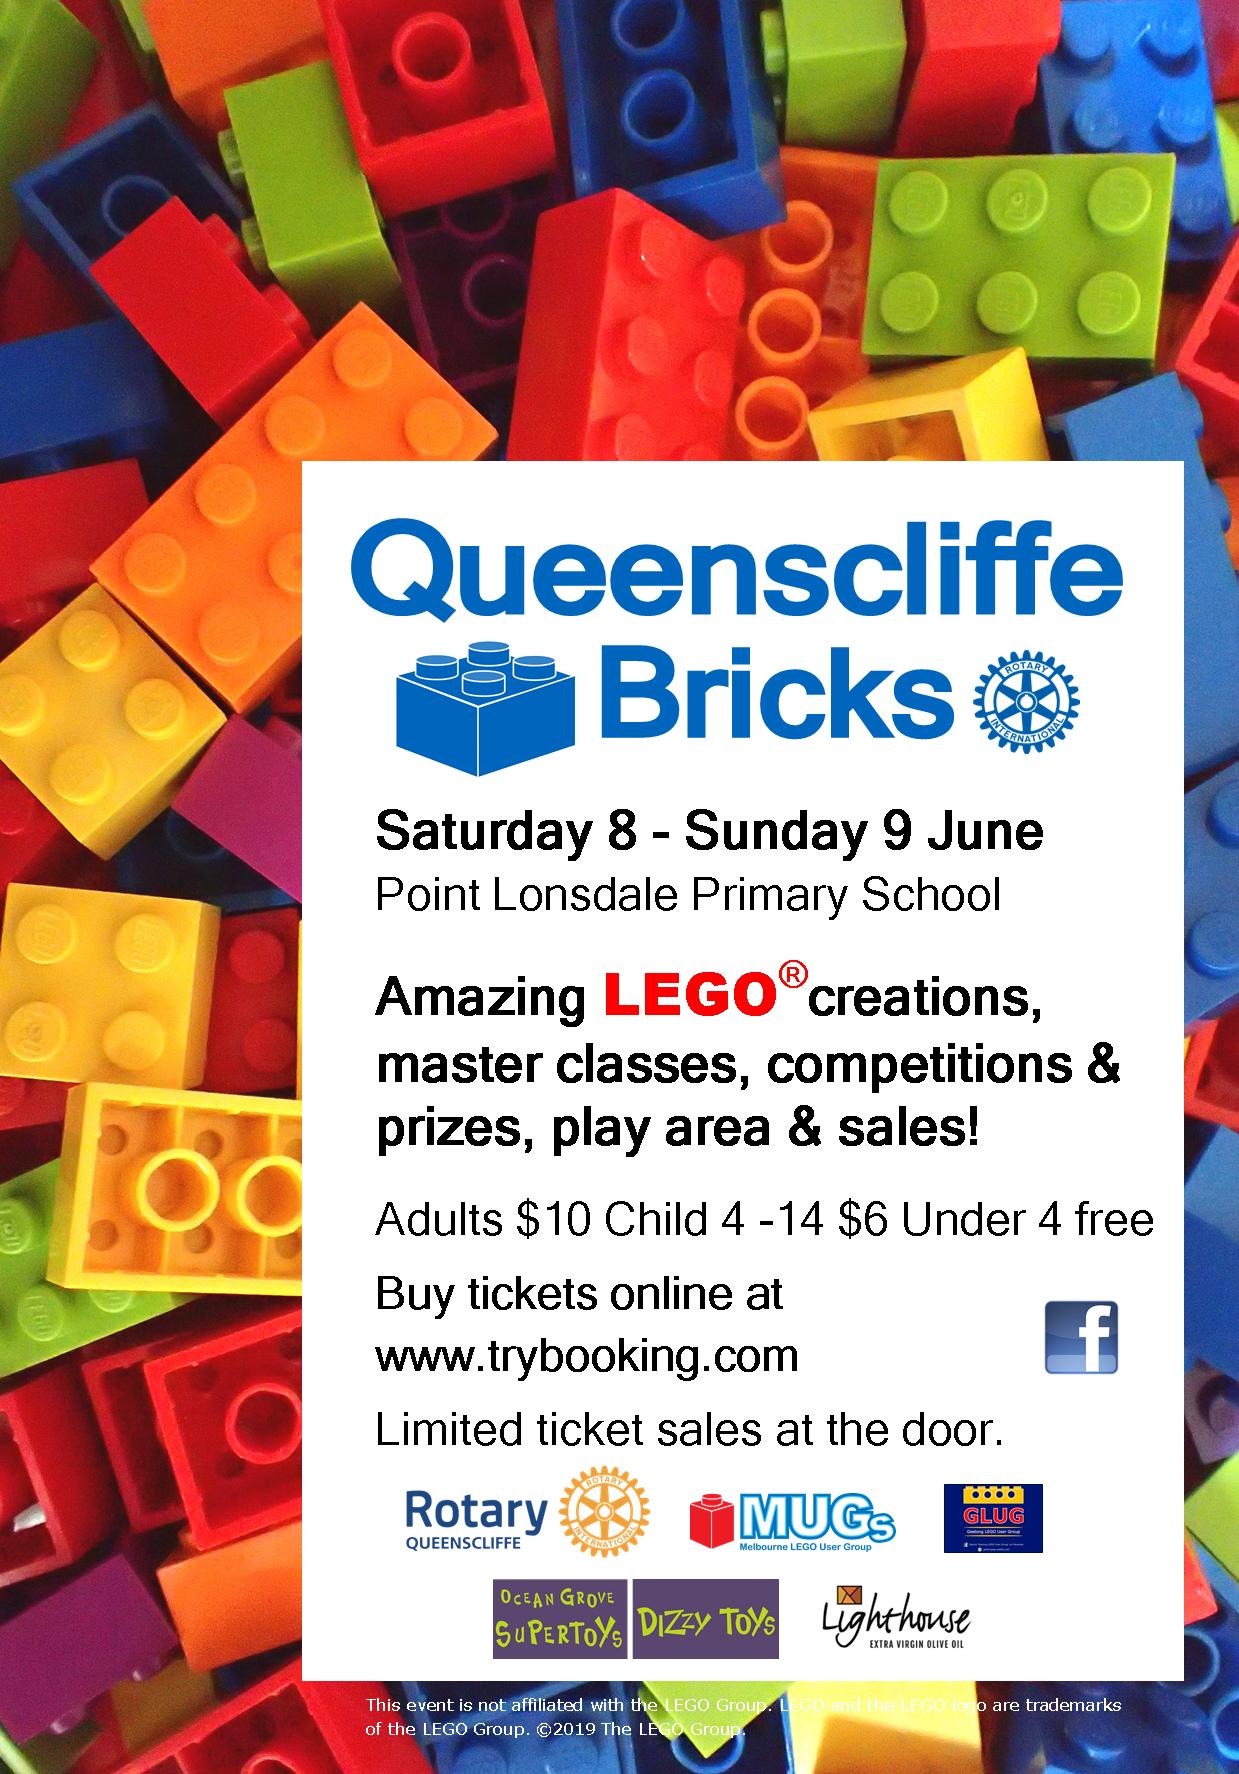 Queenscliffe Bricks 2019 - are you a Future LEGO Master